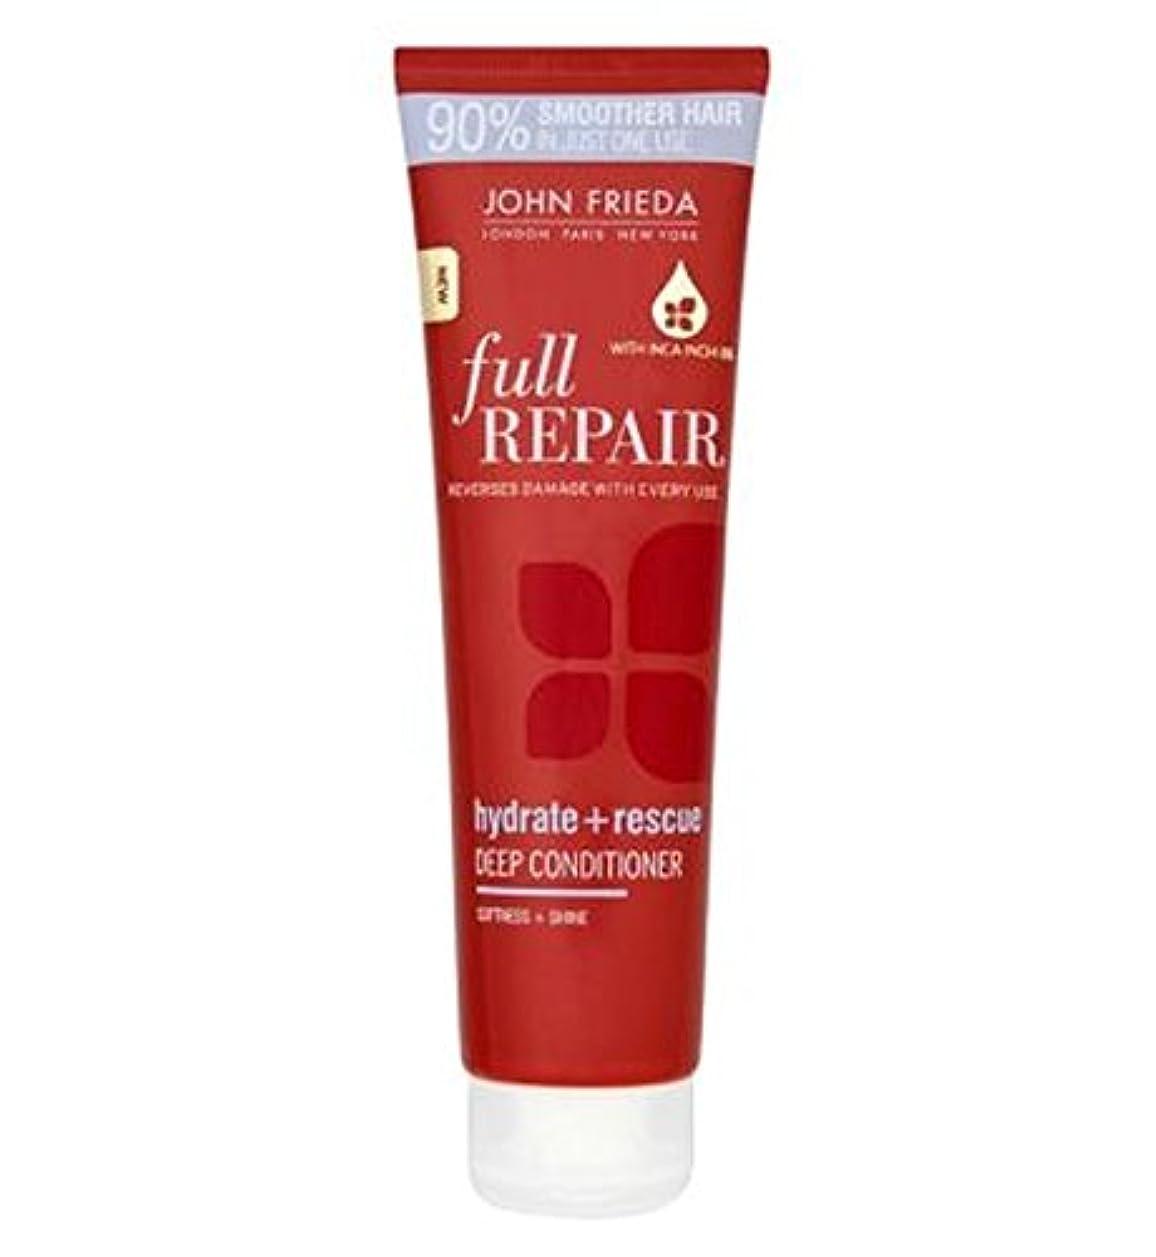 John Frieda Full Repair Hydrate + Rescue Deep Conditioner 150ml - ジョン?フリーダ完全な修復水和物+救助深いコンディショナー150ミリリットル (John...